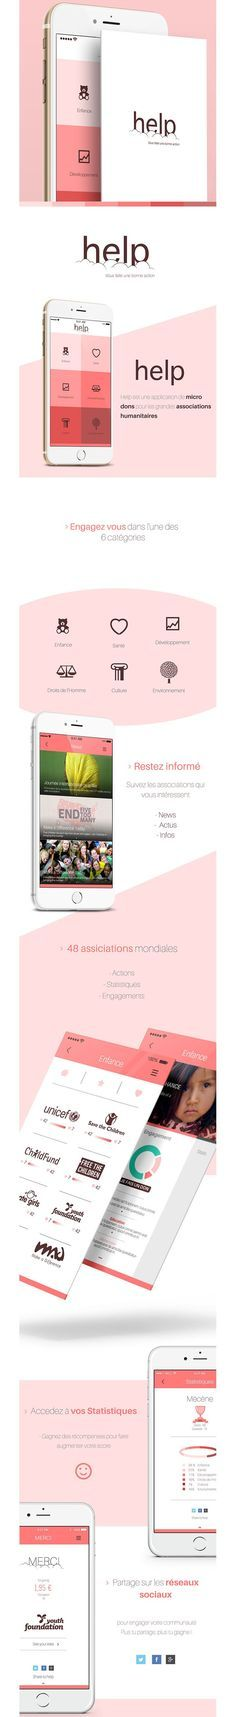 Mobile App / Flat Design app ios iphone smartphone #help #mobile #ui